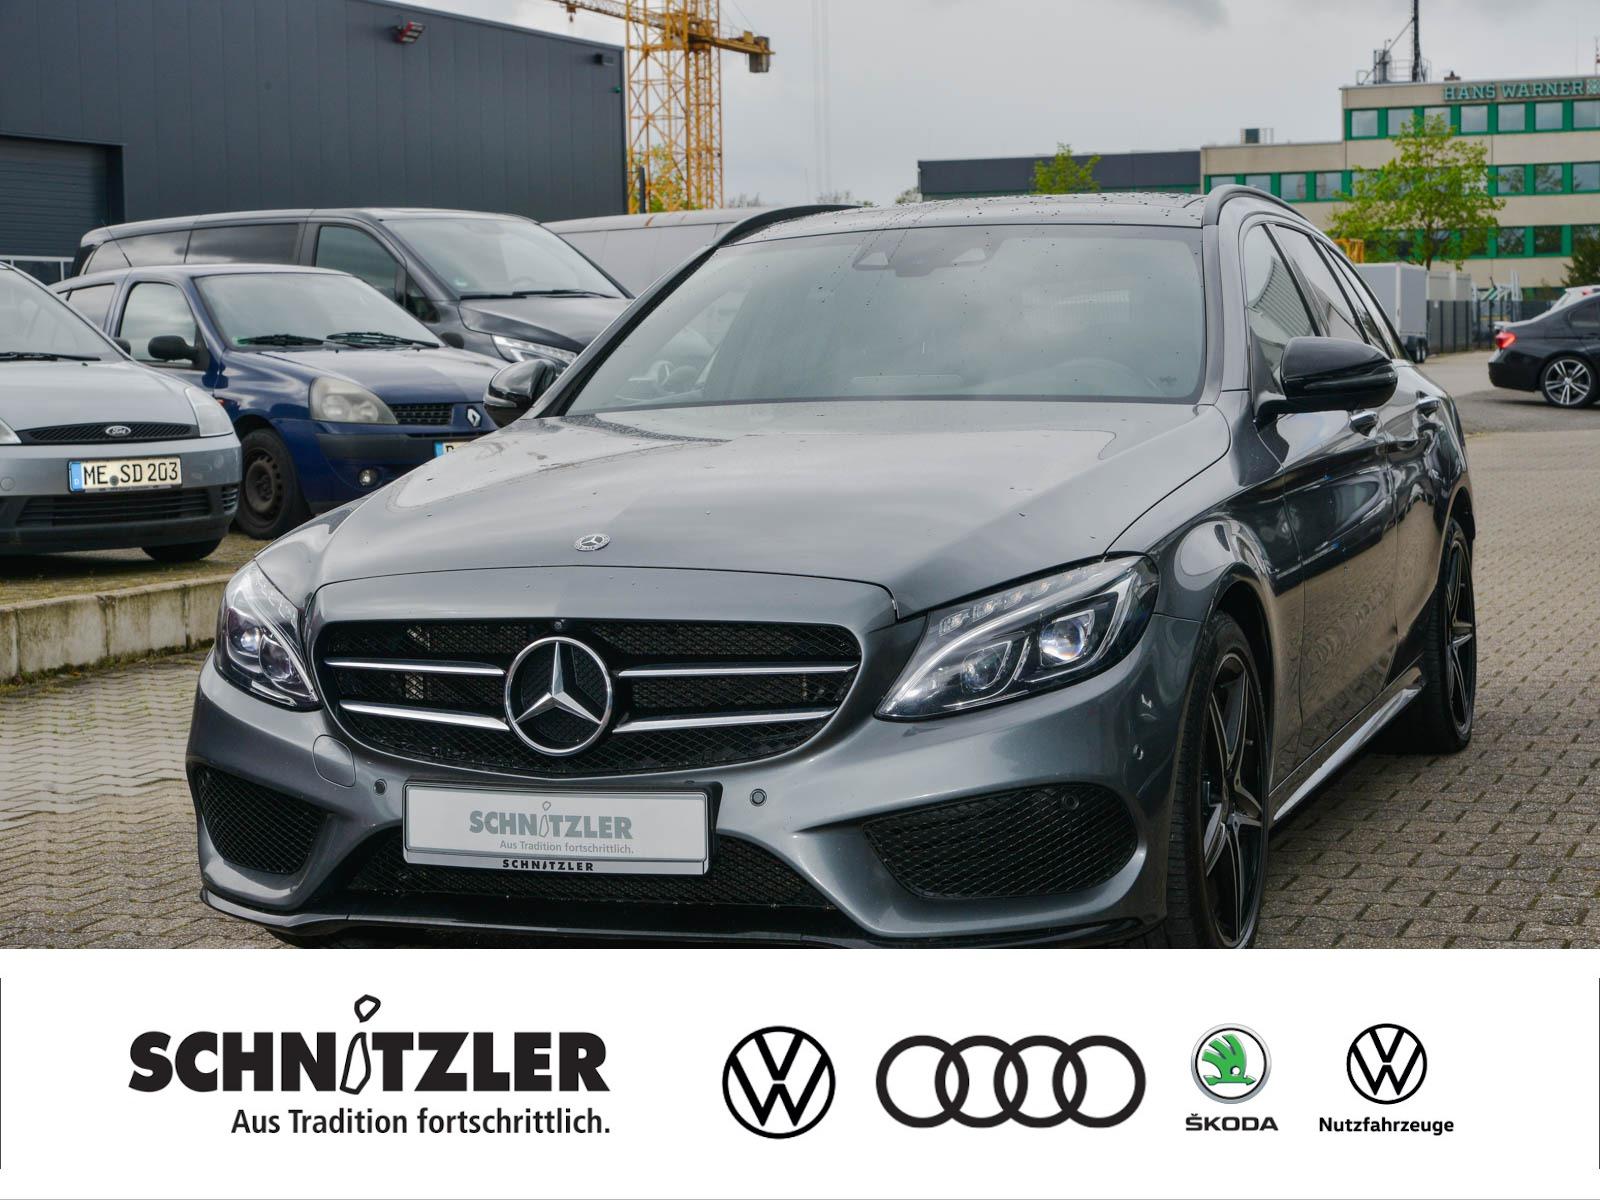 Mercedes-Benz C 250d T 4Matic Edition C Standheizung/Panorama/+++, Jahr 2017, Diesel